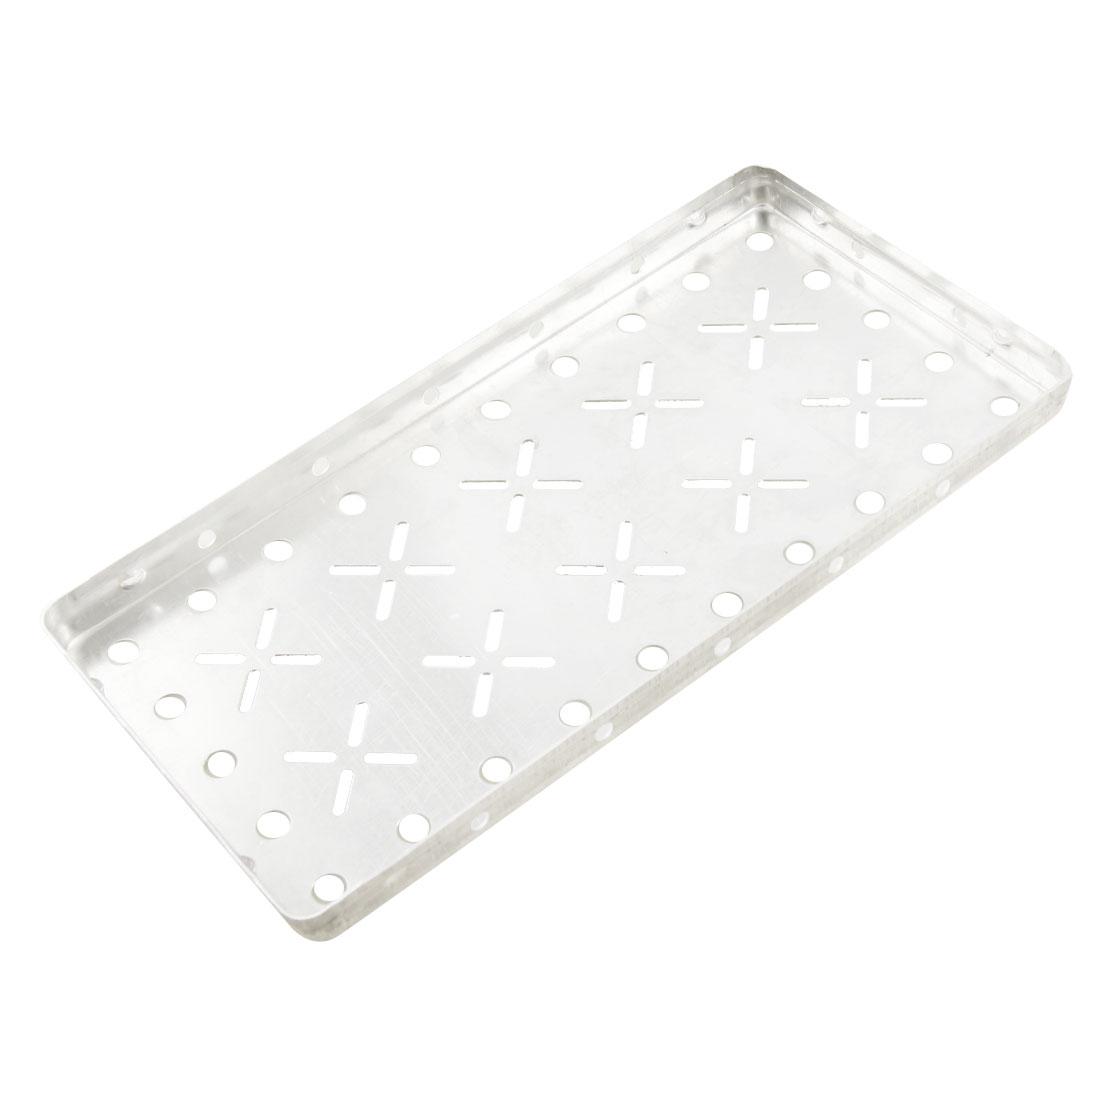 Sliver Tone 23cm x 12cm x 1.5cm Diamond Tread Plate Peg Aluminum Board